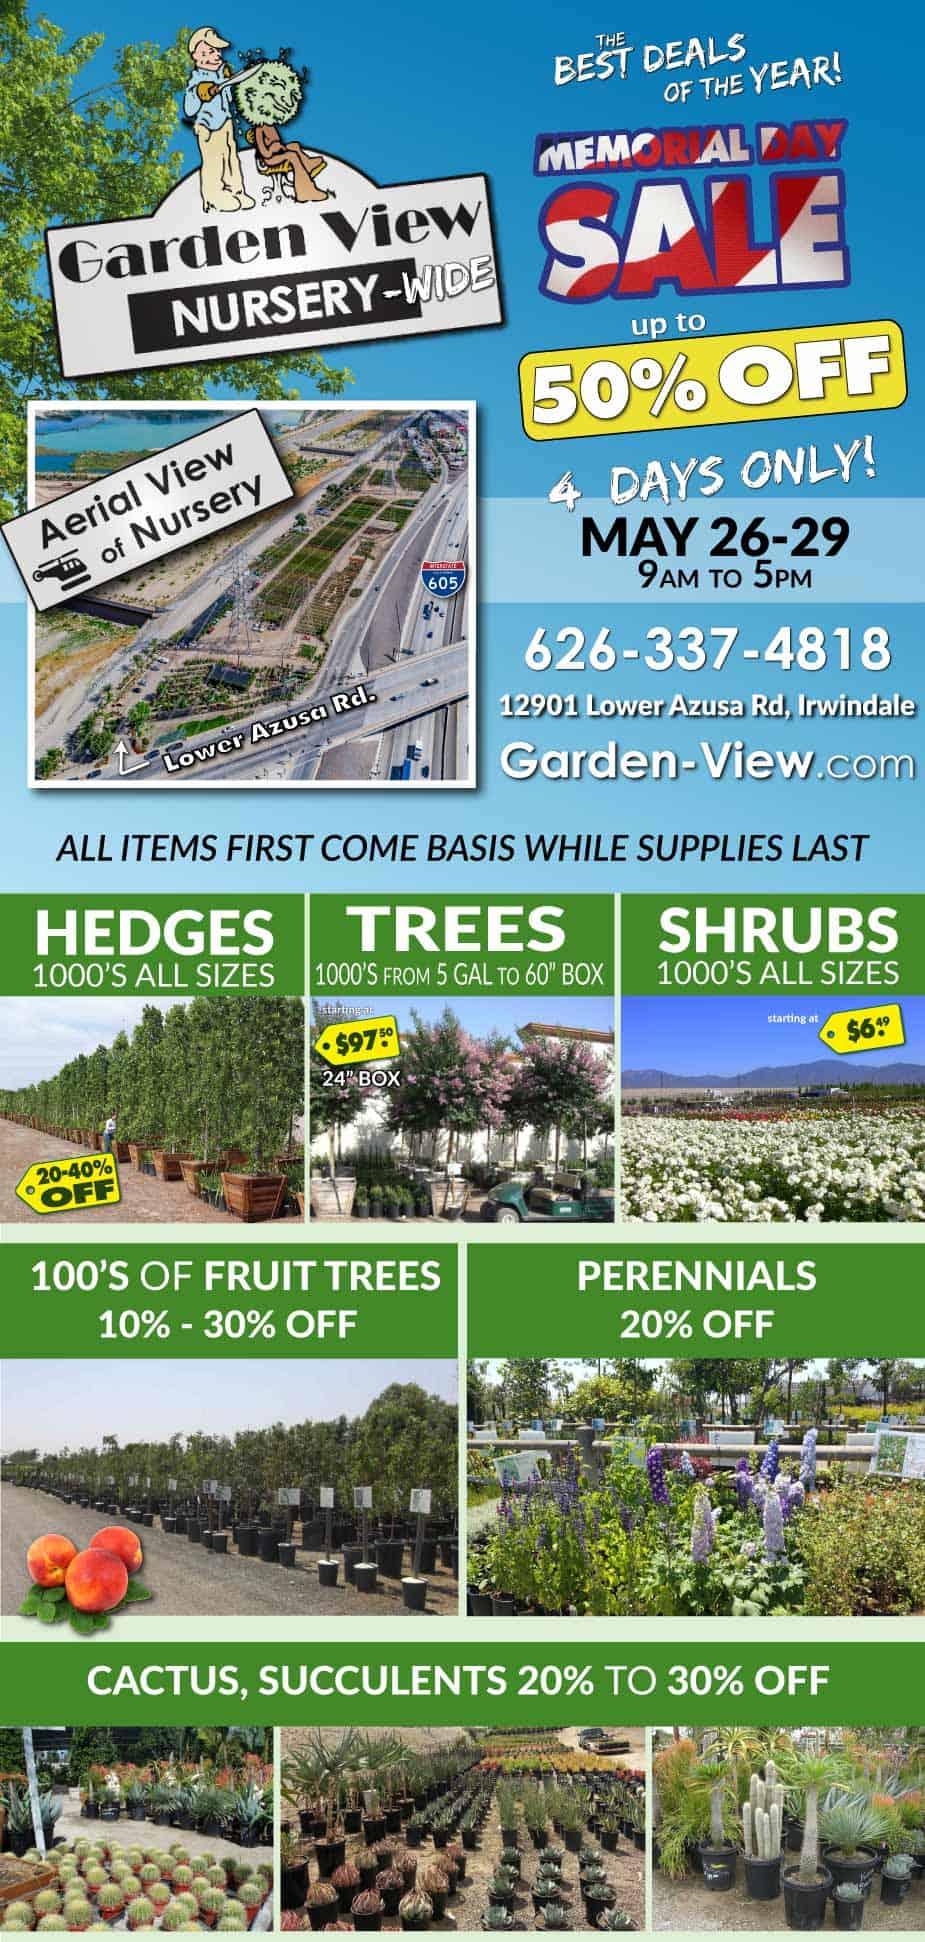 Memorial Day Sale 2017